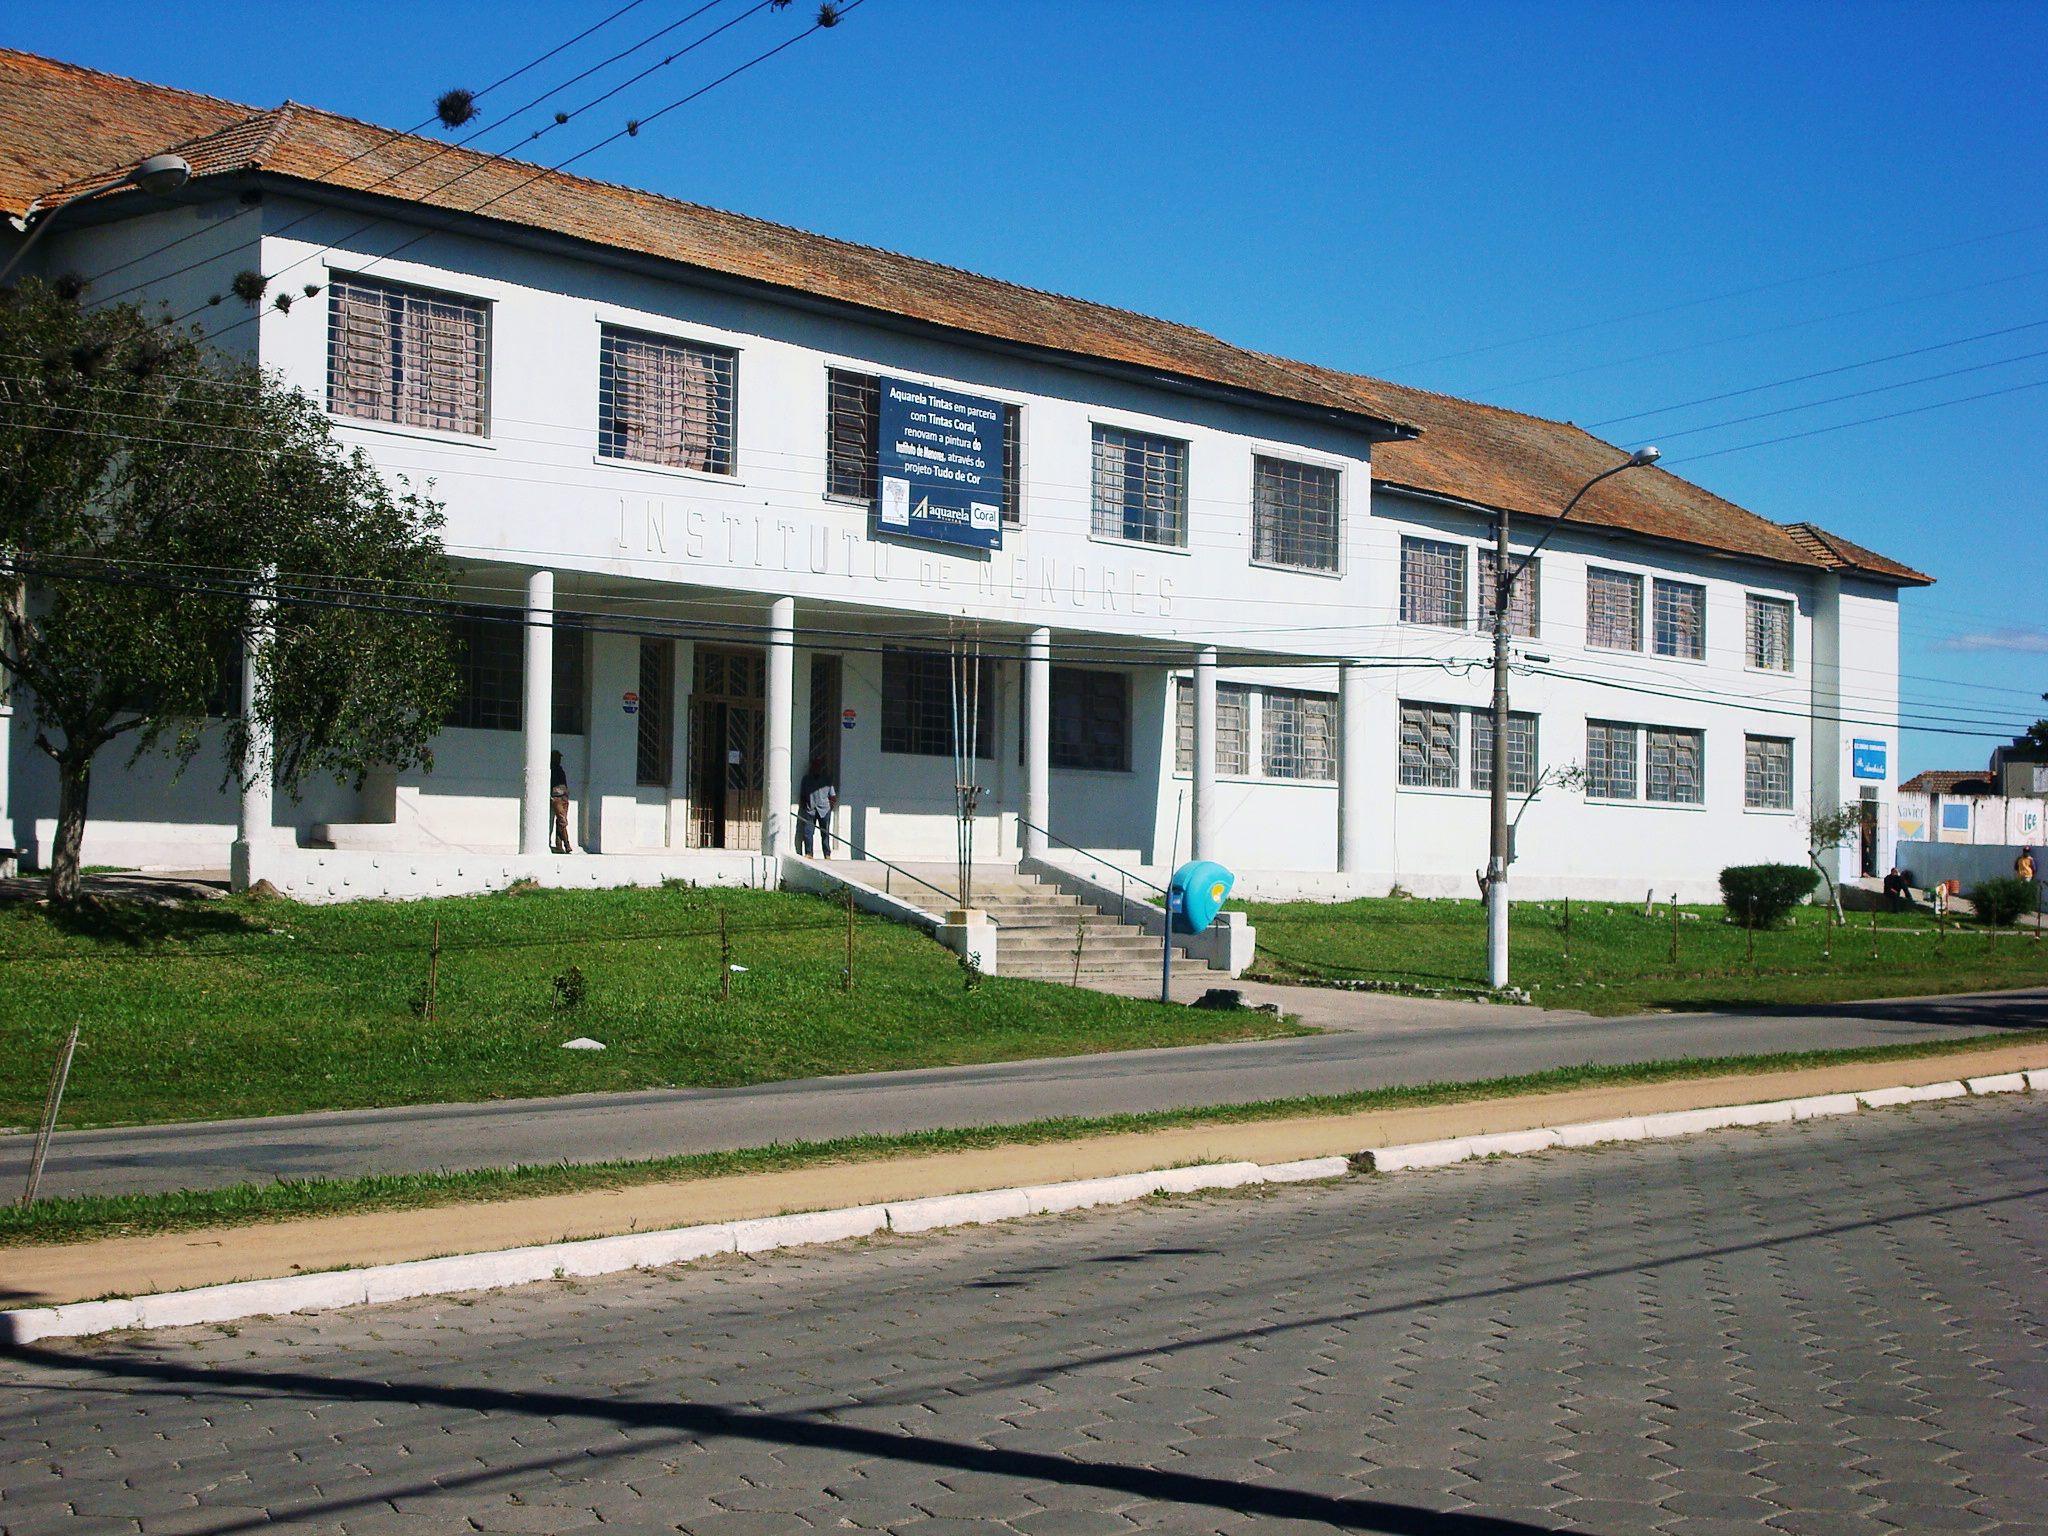 Instituto de Menores Dom Antônio Zattera